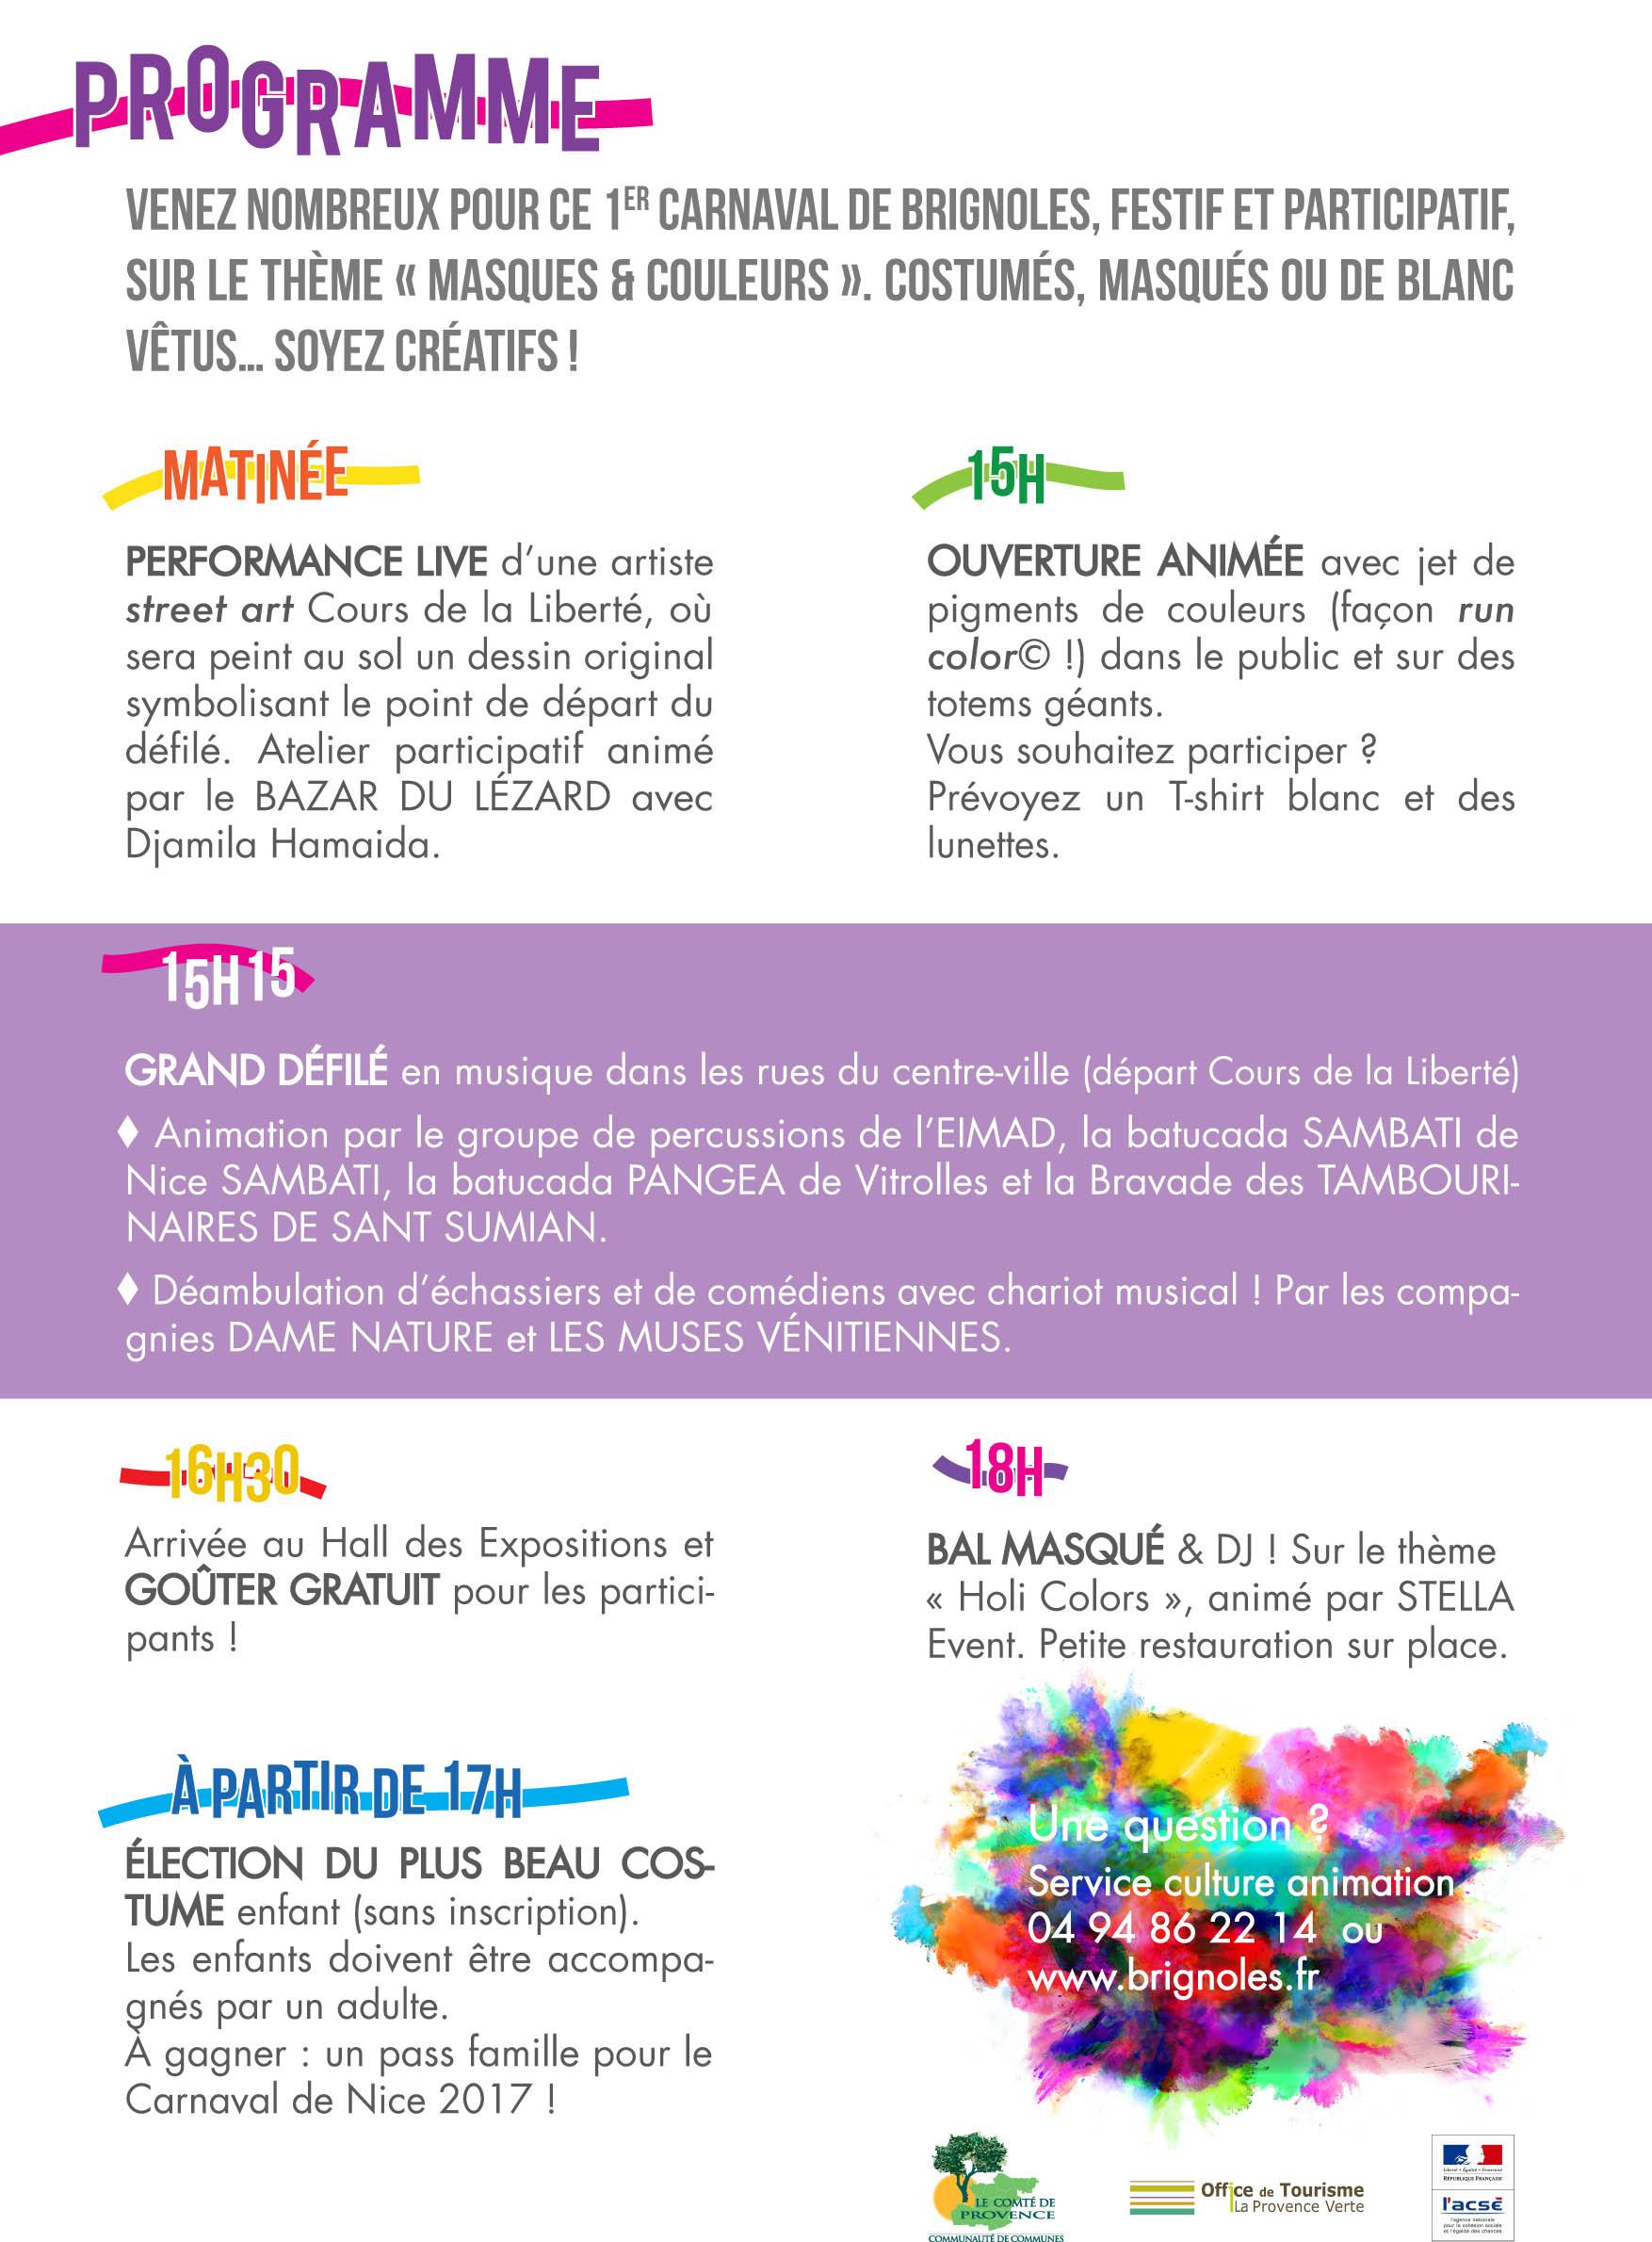 http://www.brignoles.fr/documents/Agenda/FLYER_CARNAVAL-1.jpg